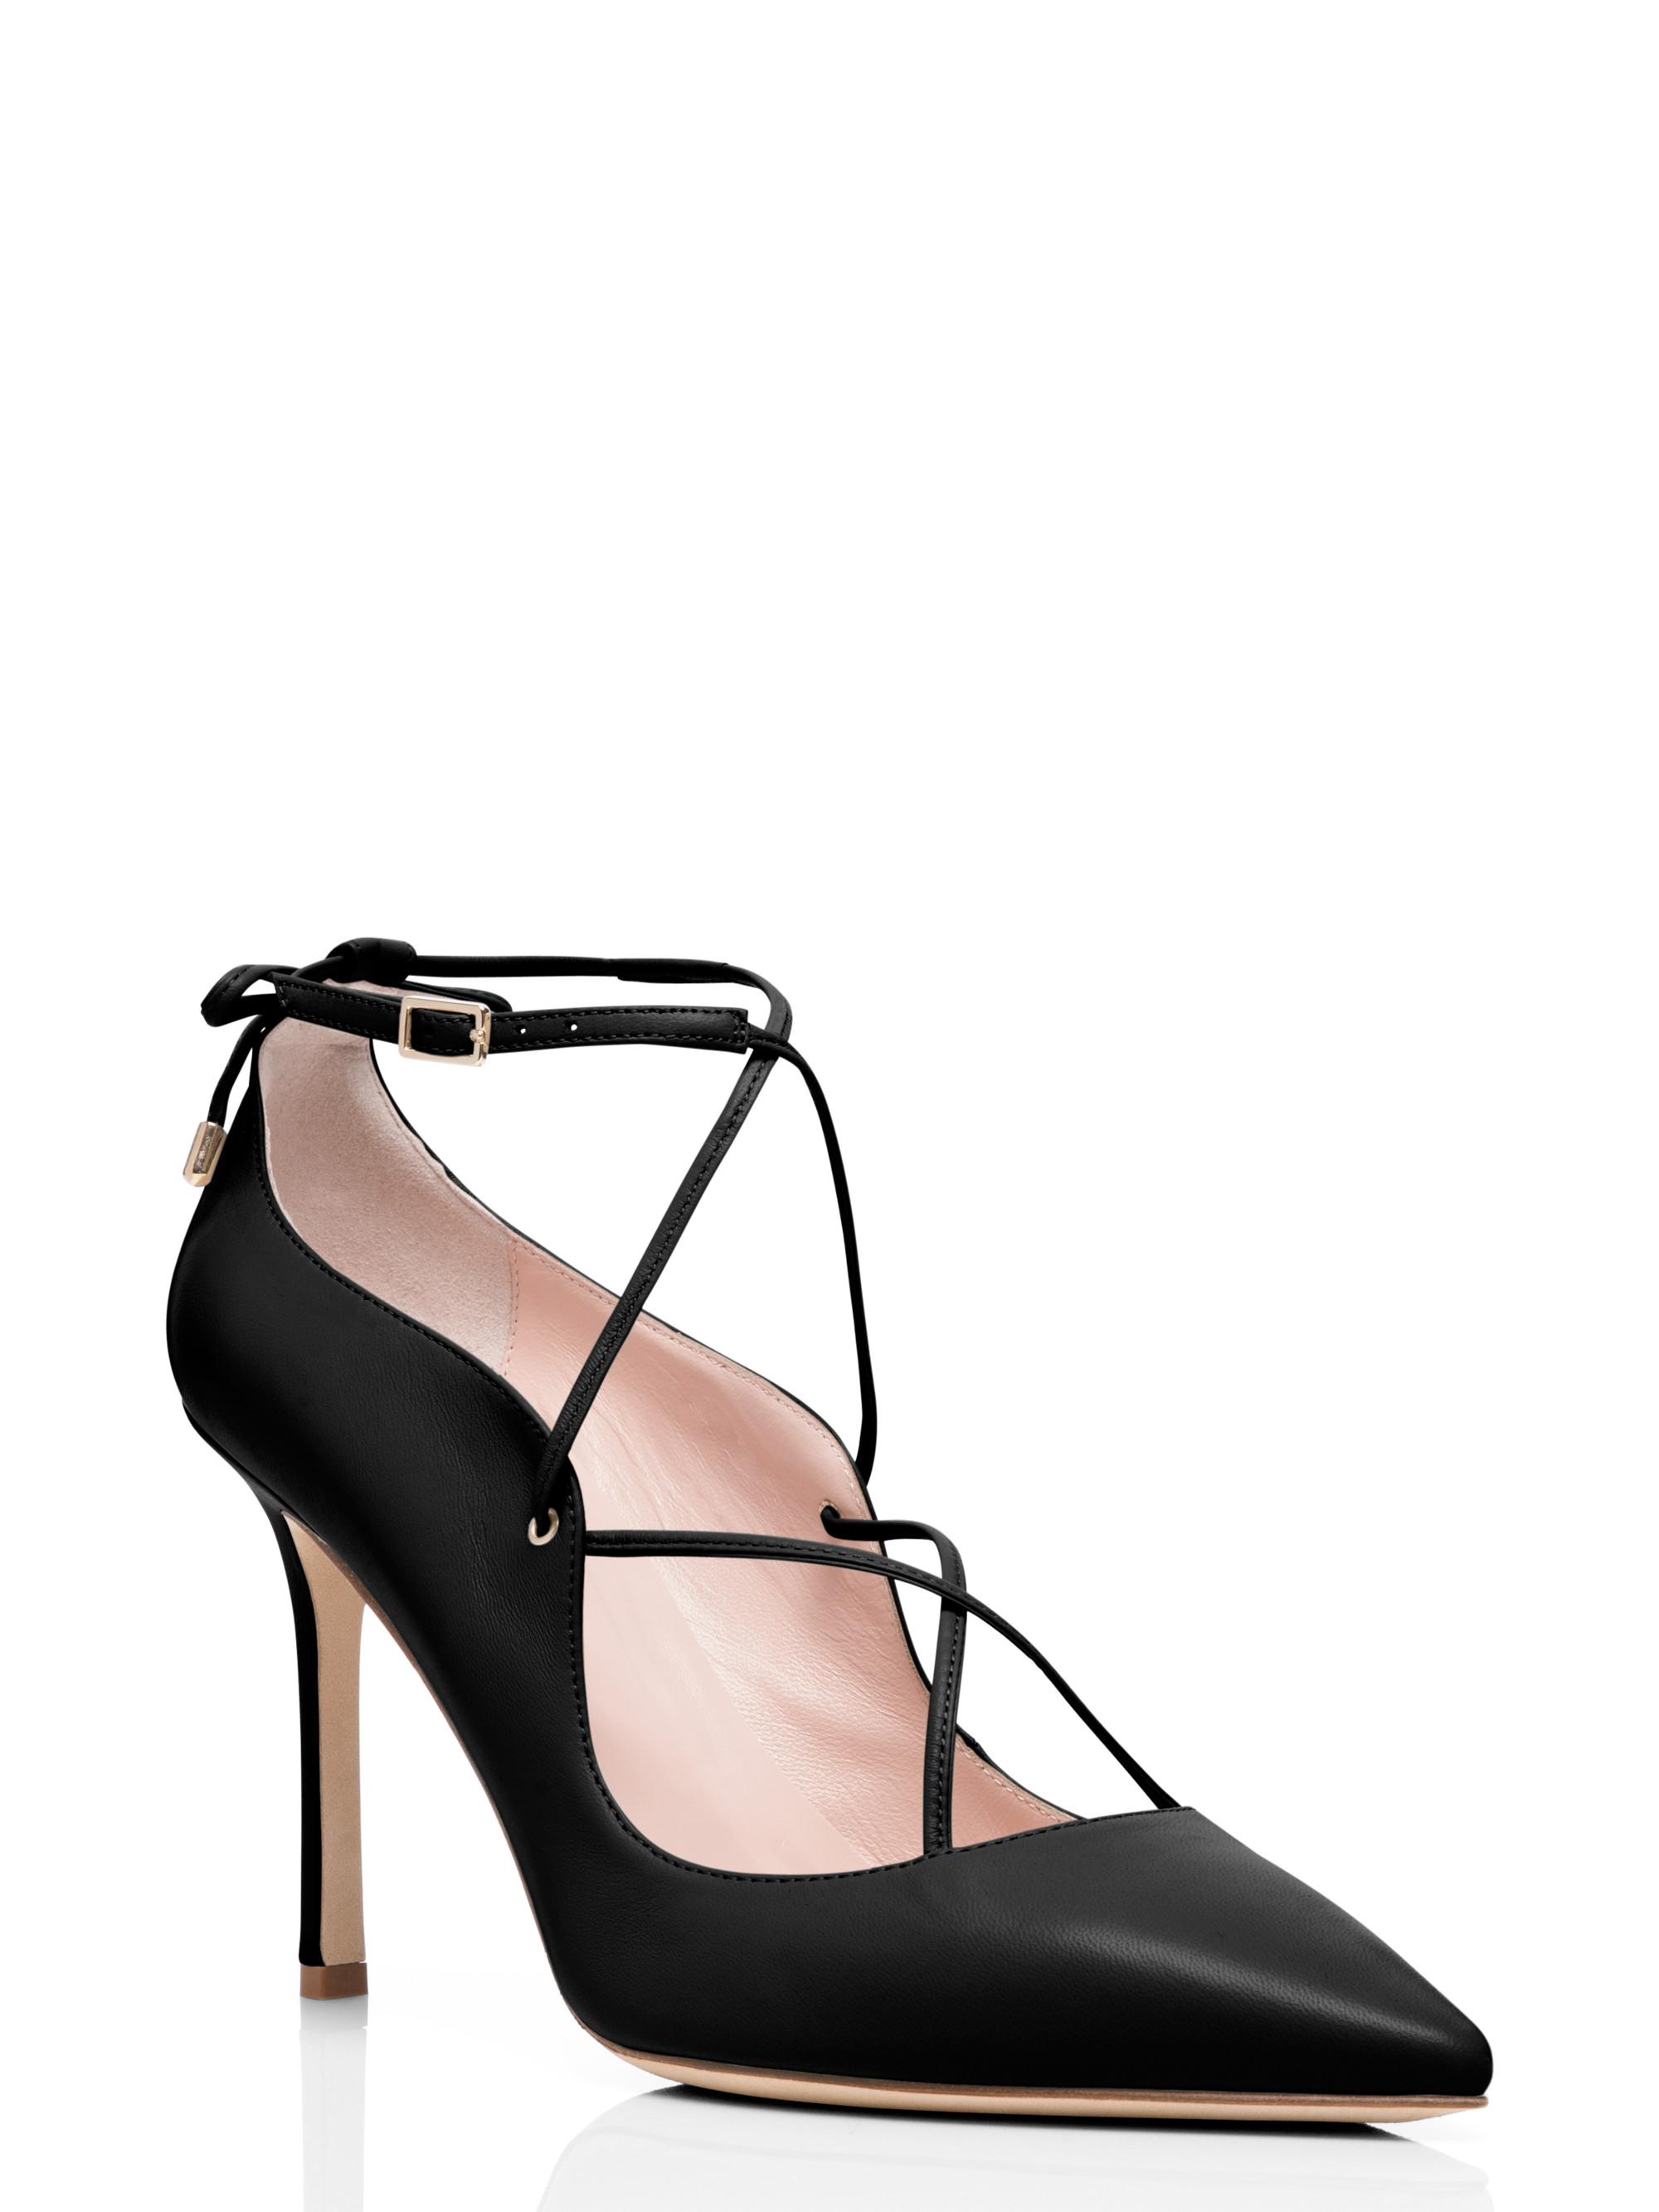 659c6da64cbf priscilla heels